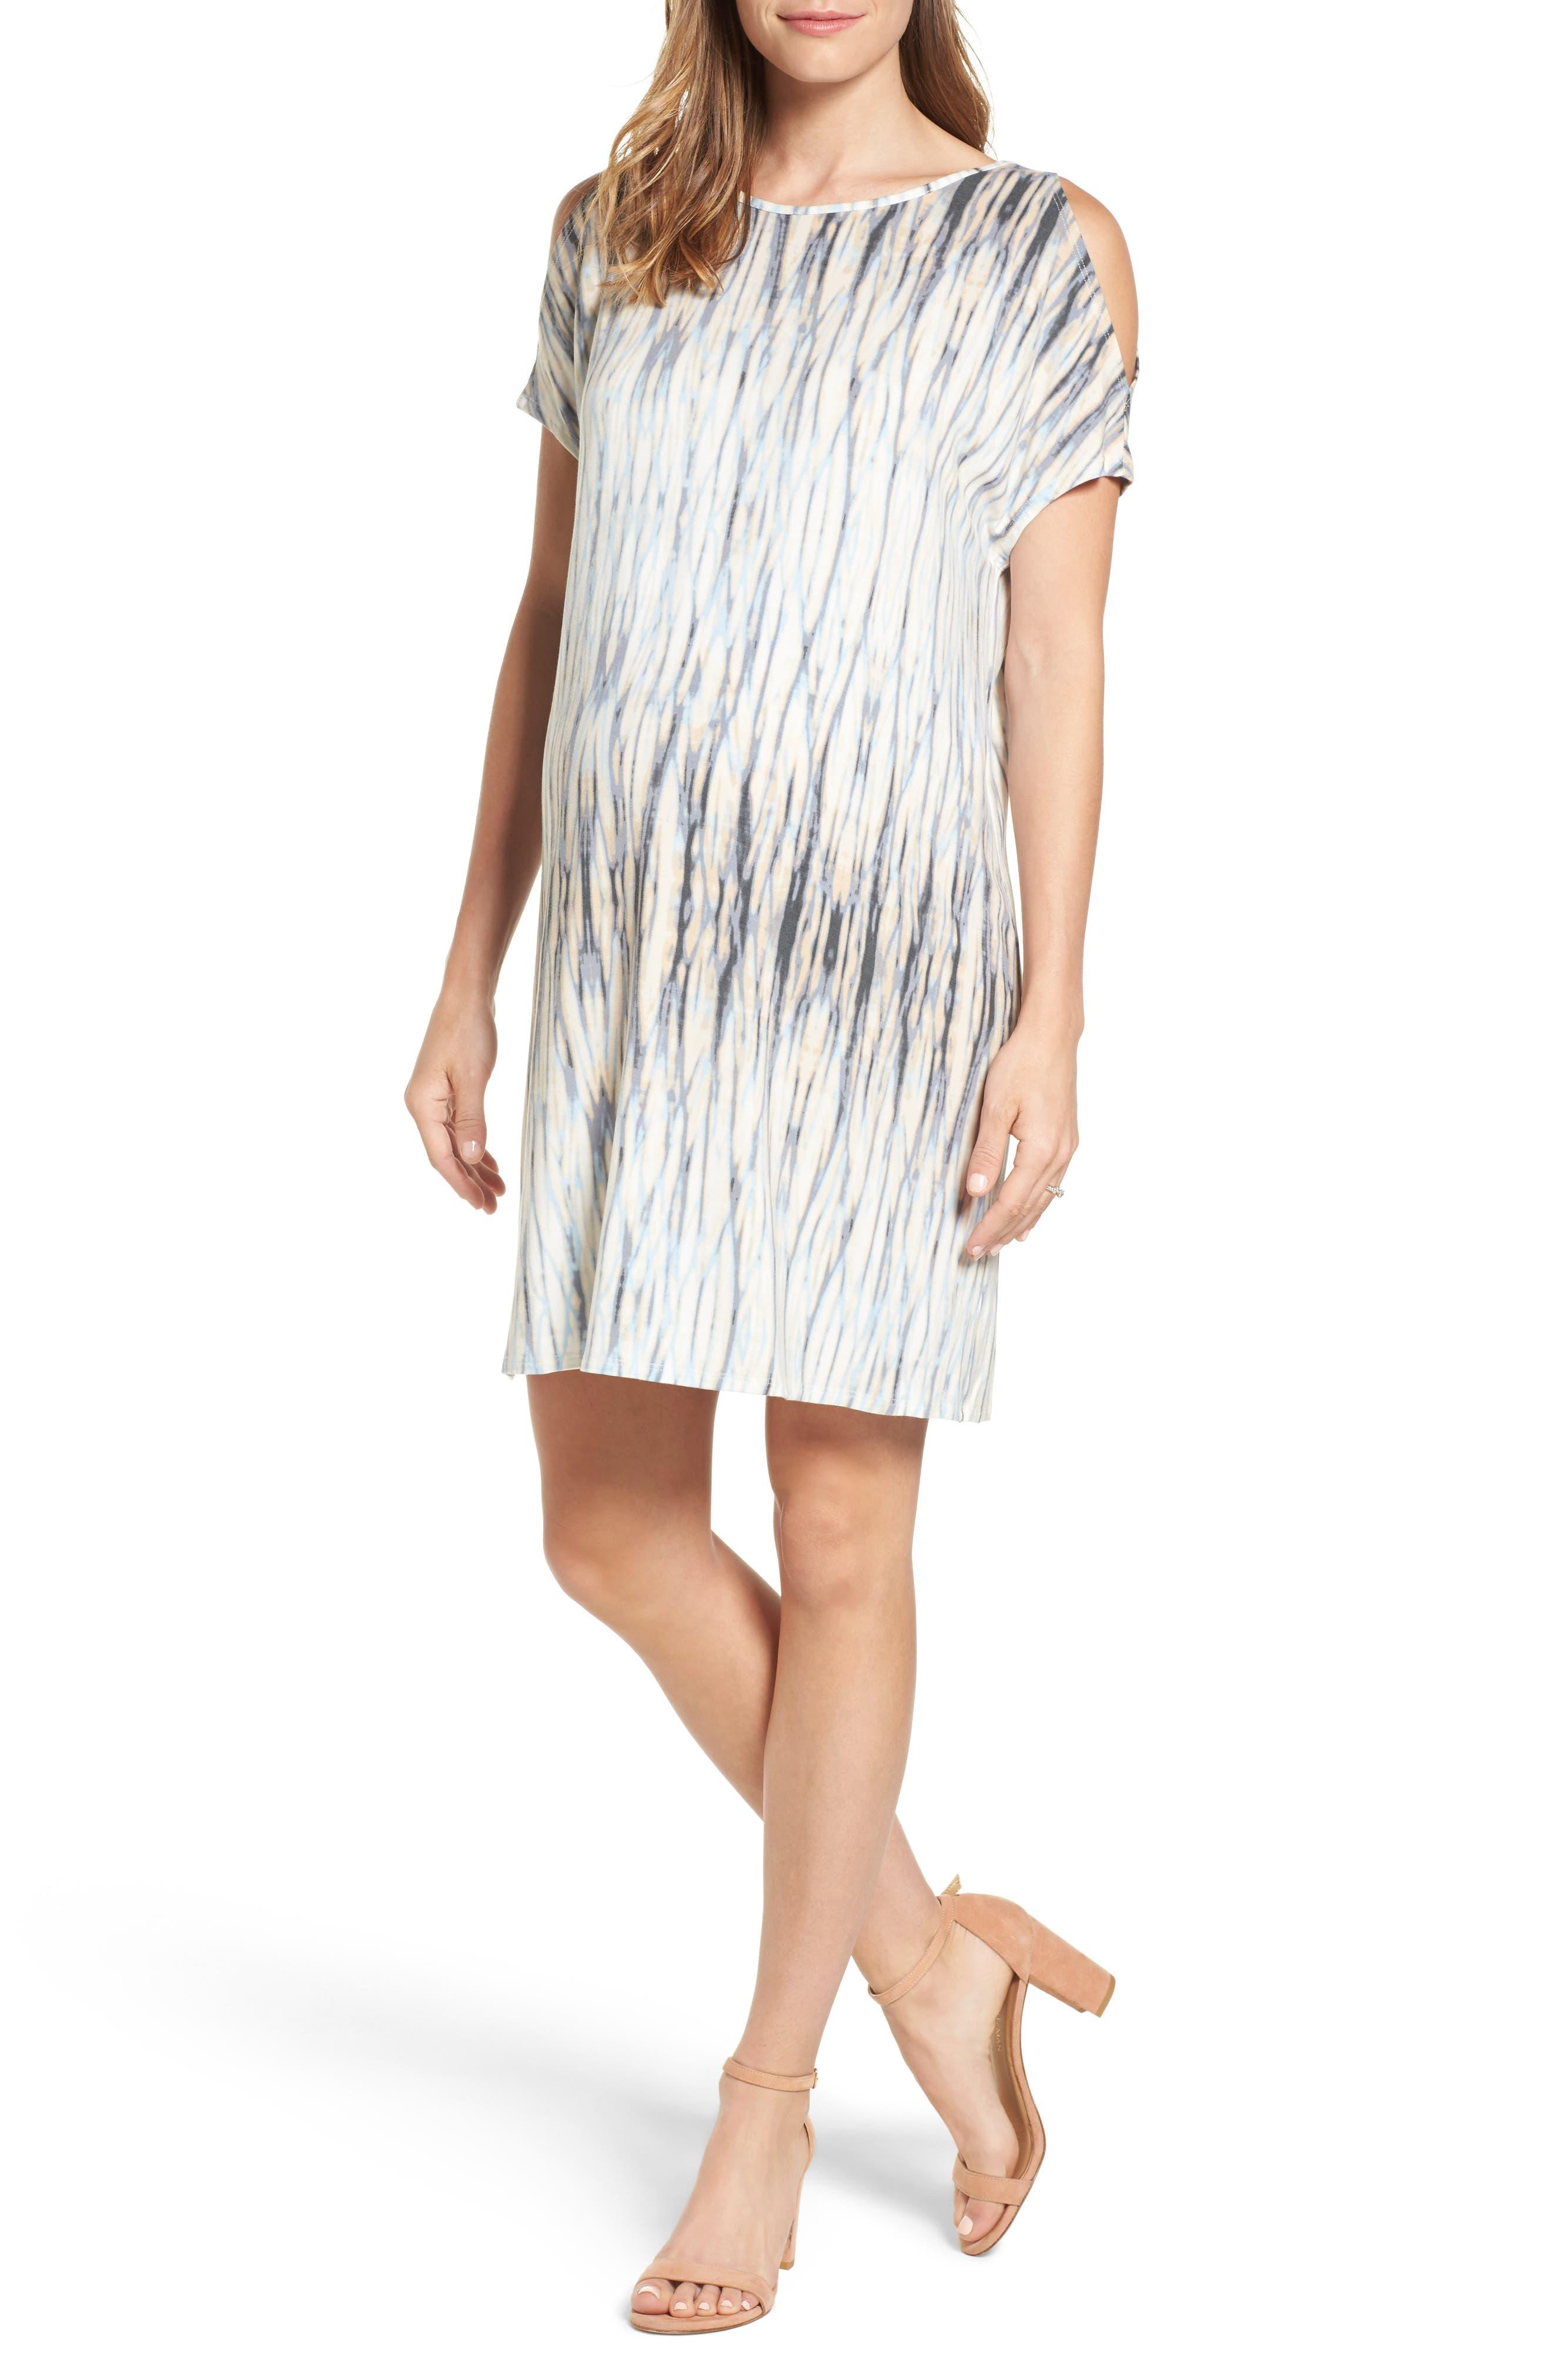 Main Image - Tart Maternity Caia Cold Shoulder Maternity Dress